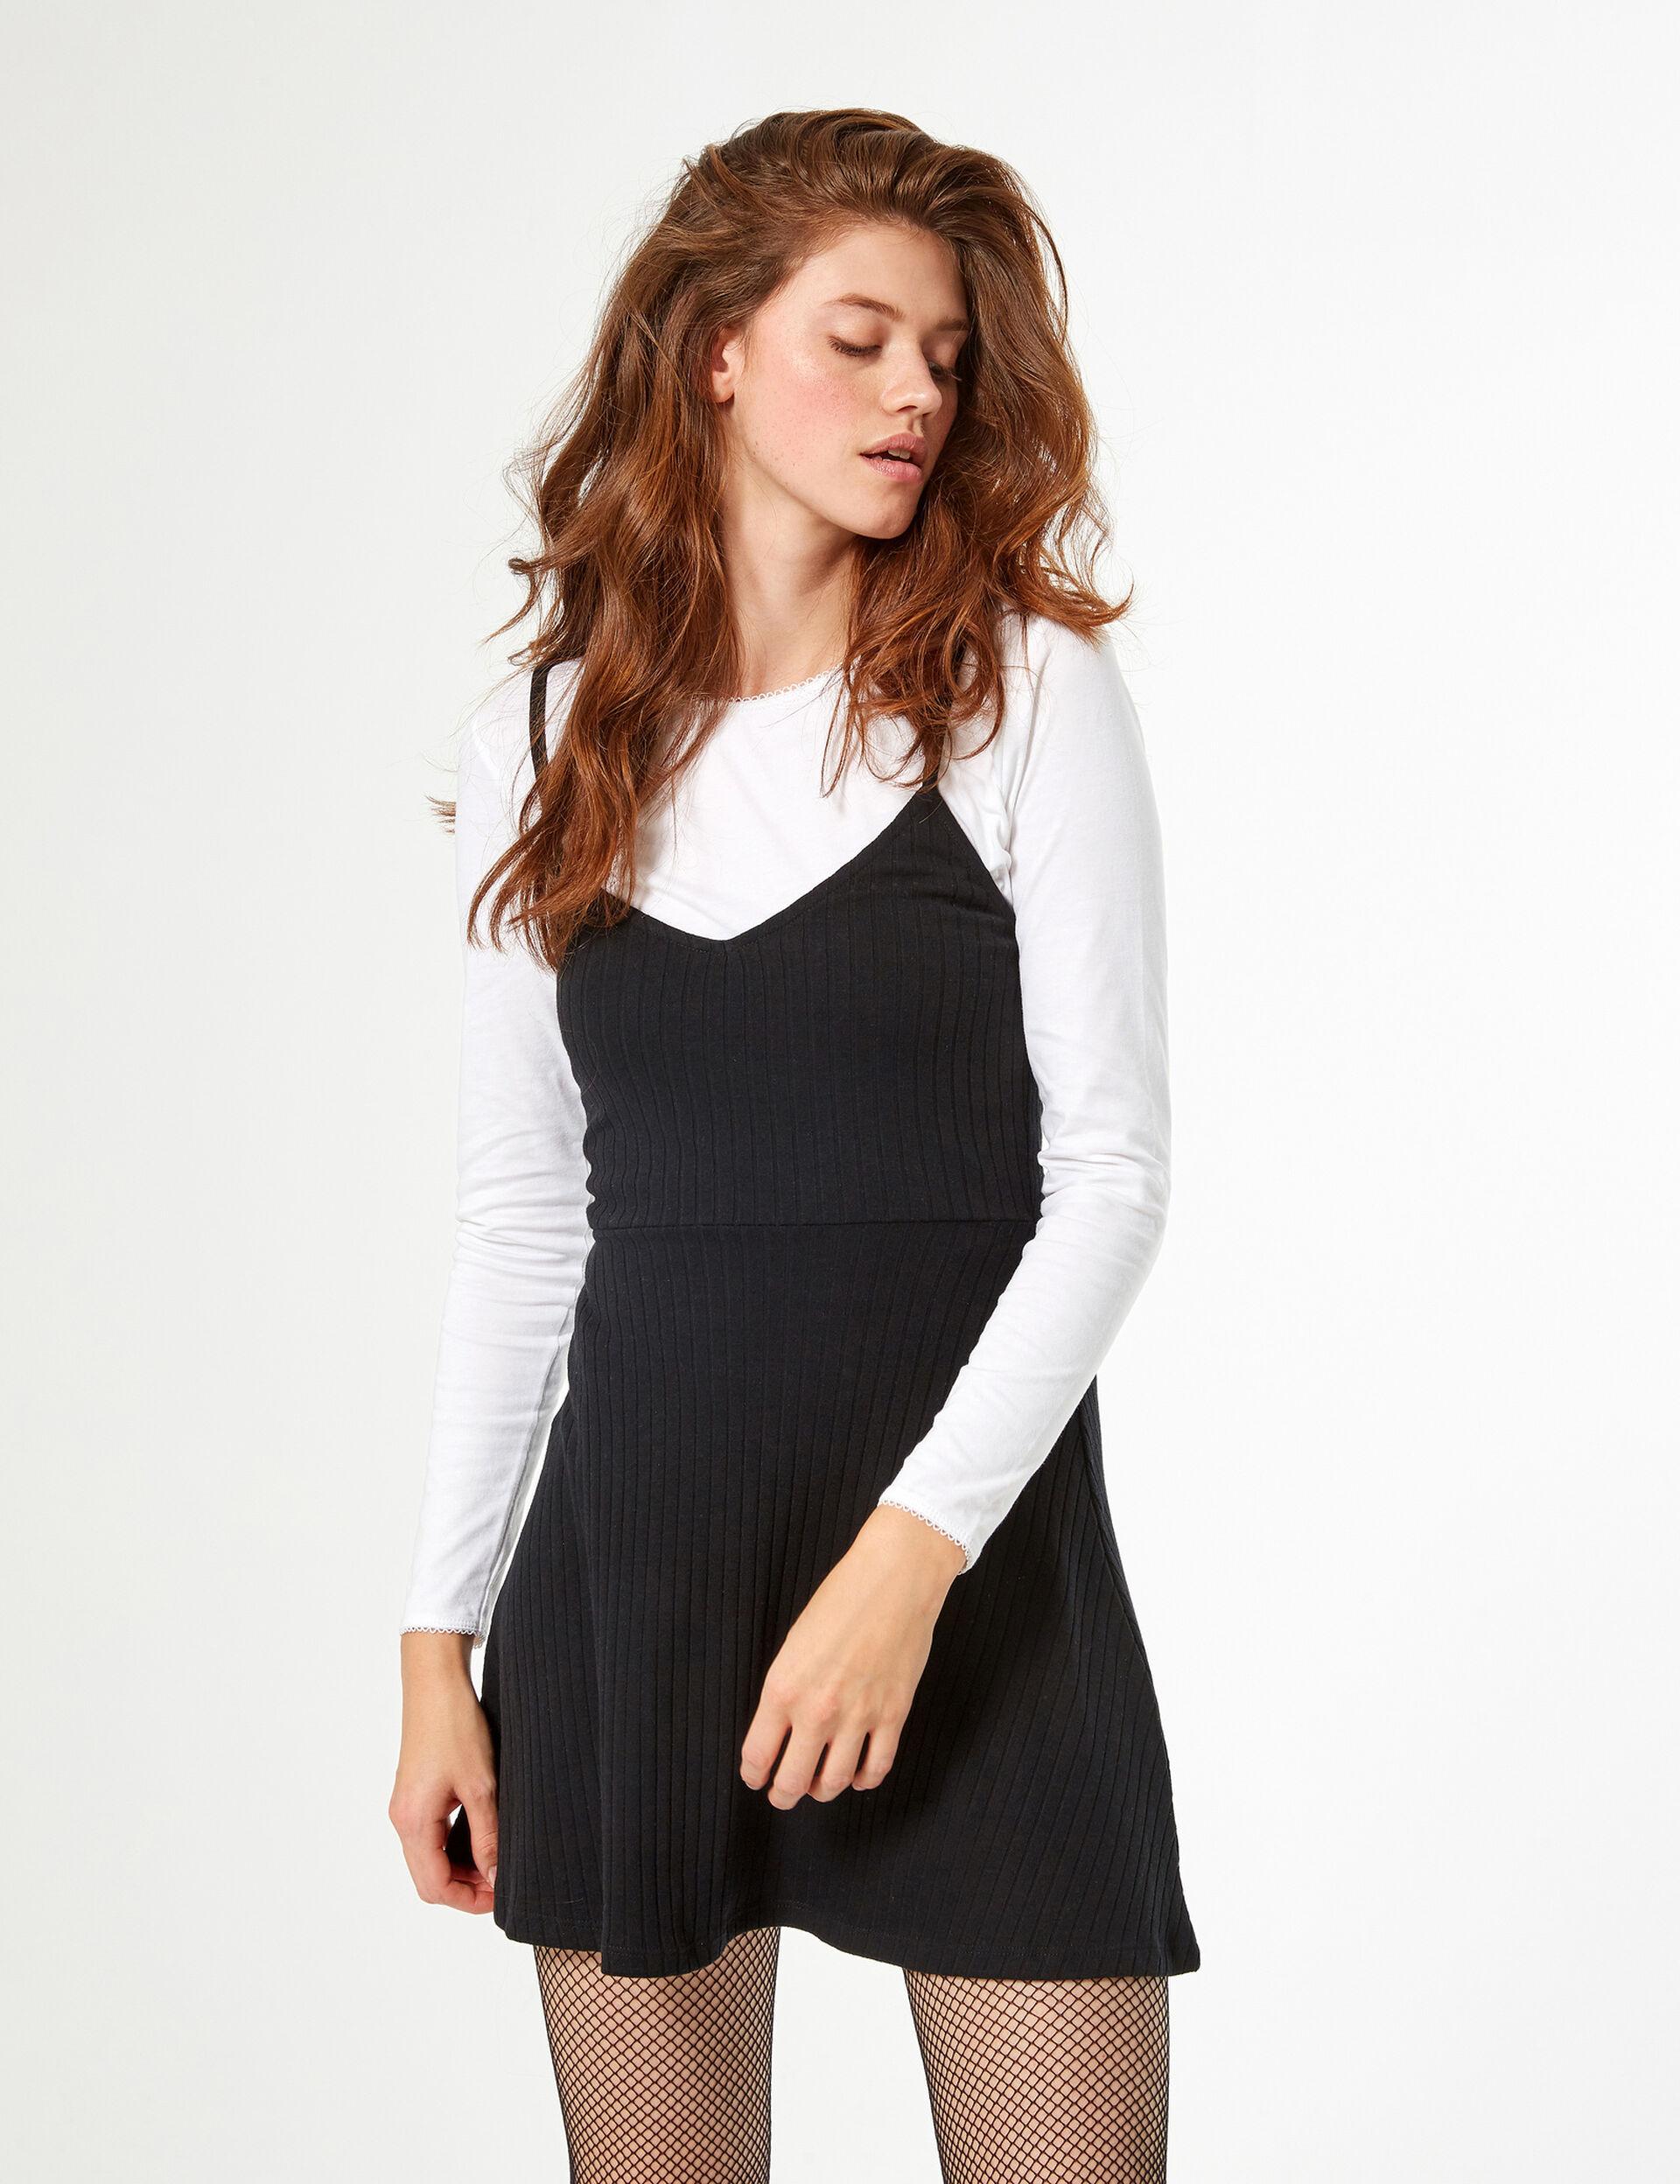 Robe doublée avec tee-shirt